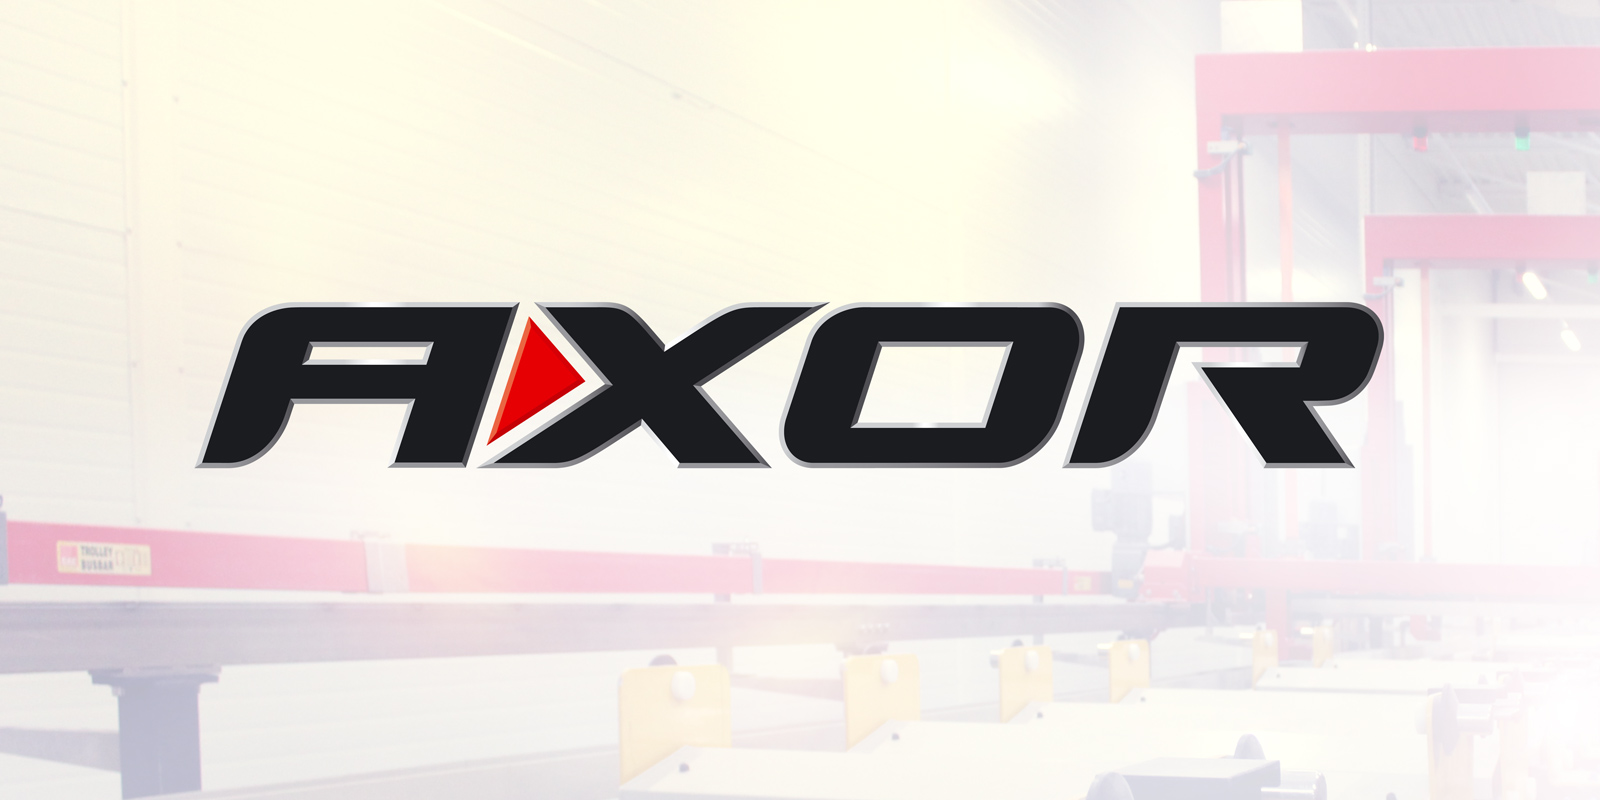 TM Axor;;;;;;Разработка логотипа;;;;;;<span>Клиент:</span> Axor Industry;;;;;;;;;;;;Разработка логотипа;;;;;; 1 ;;;;;;